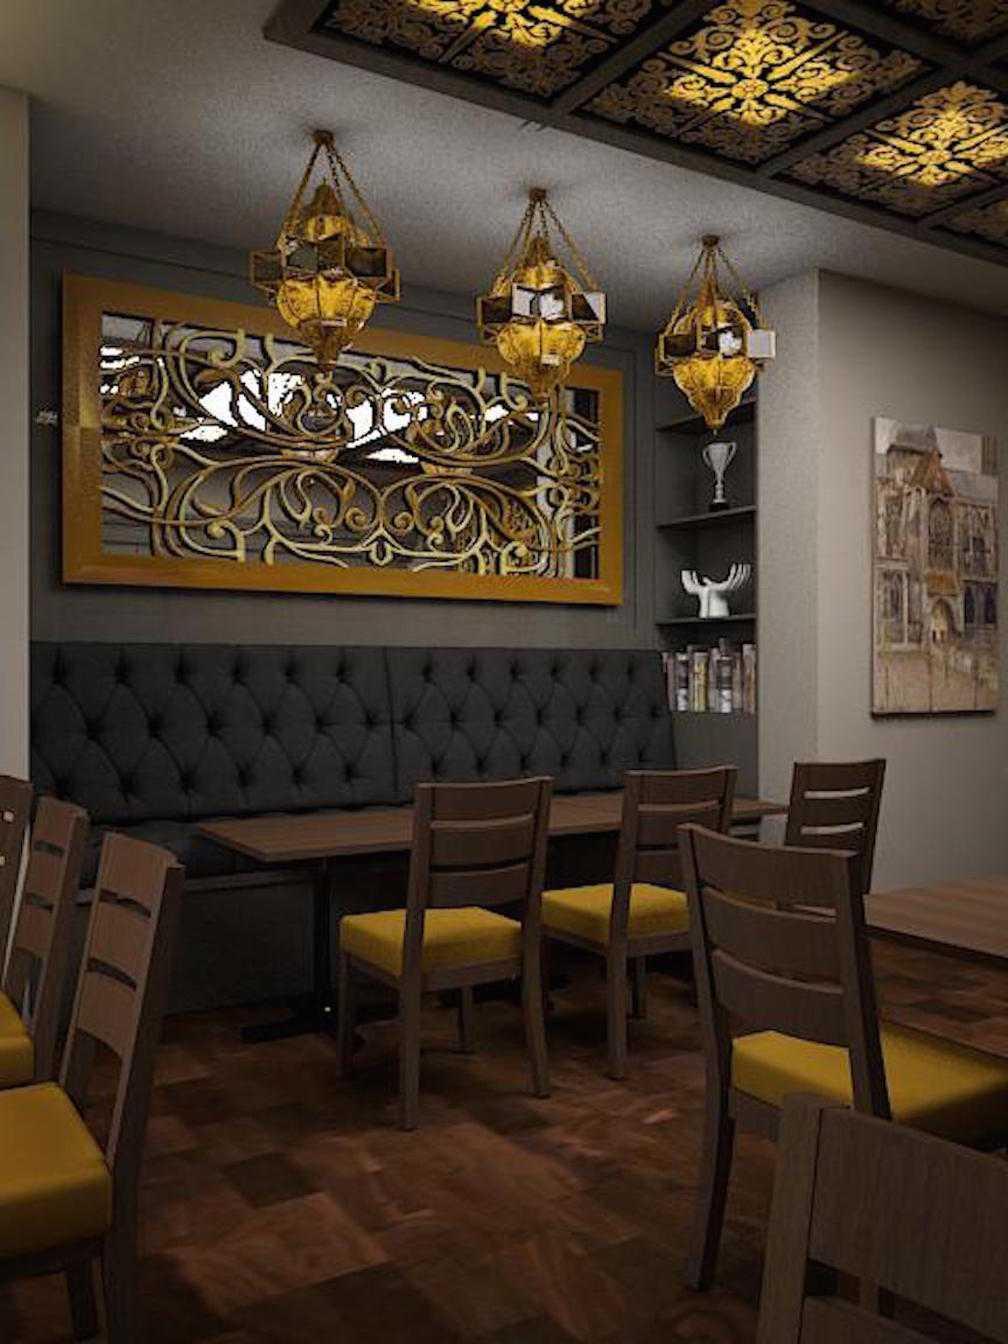 Foto inspirasi ide desain restoran tradisional Resto-cikajang dining room oleh Expo Tje. AA.AA.BSC.BA.MA di Arsitag